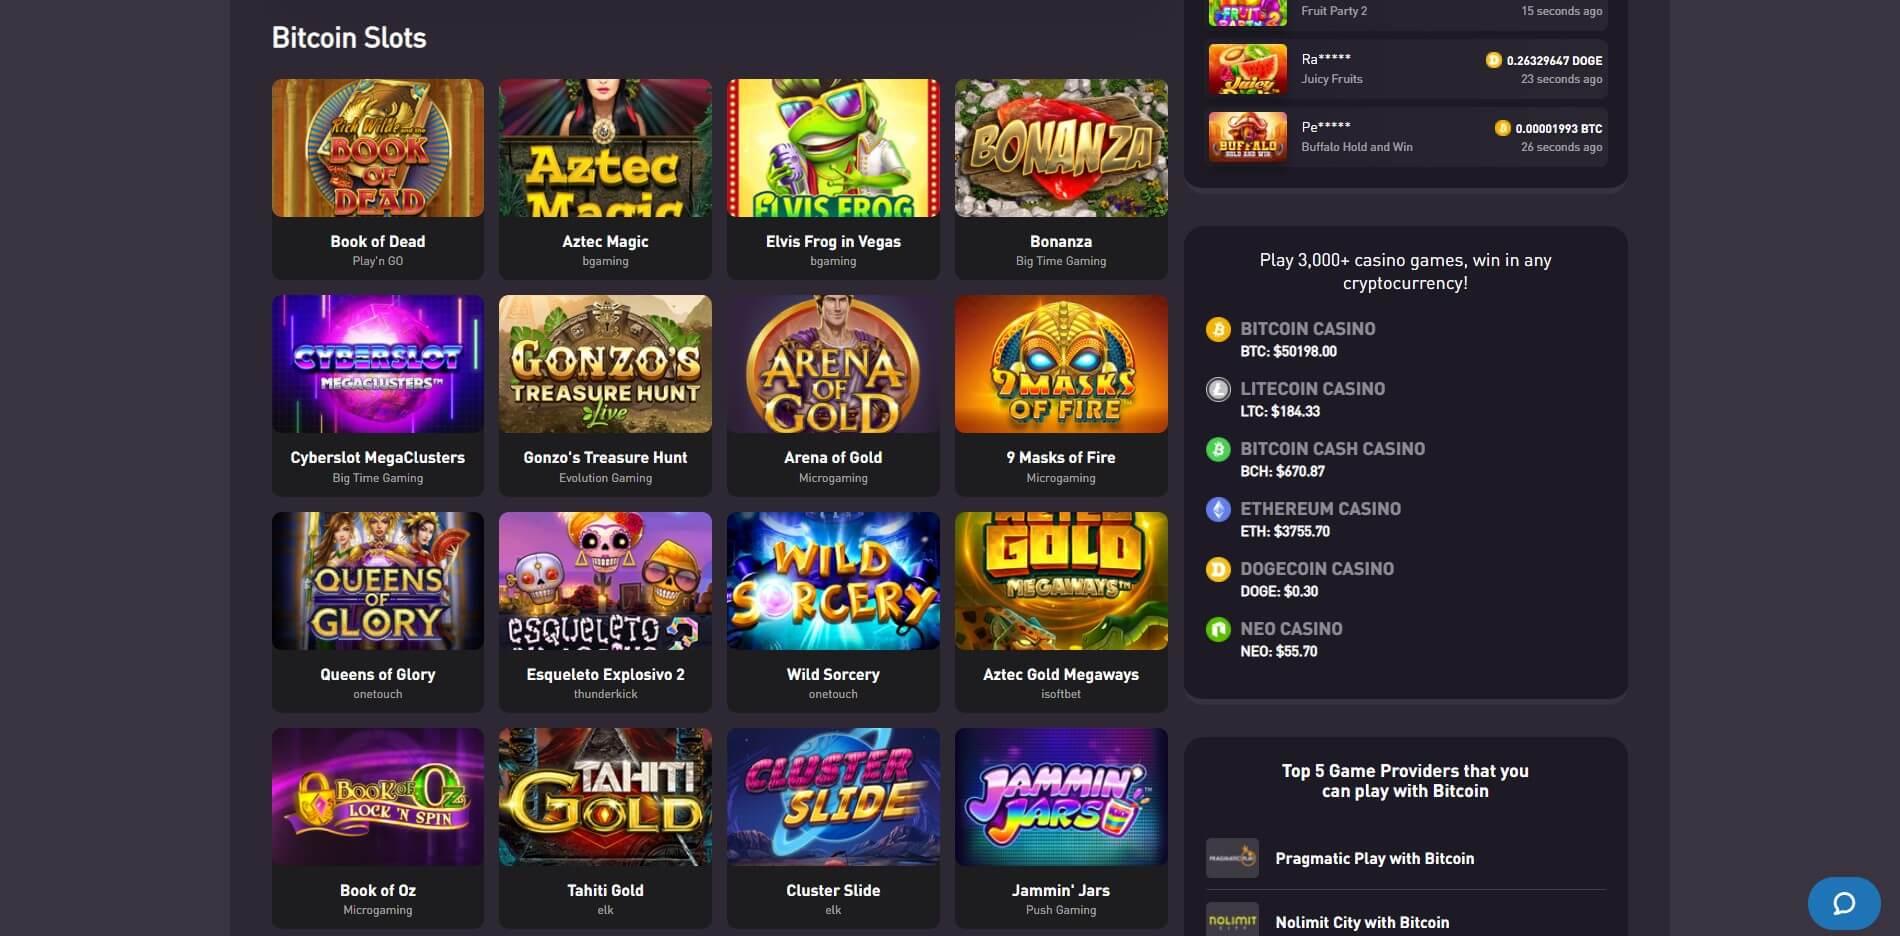 Games at RocketPot Casino